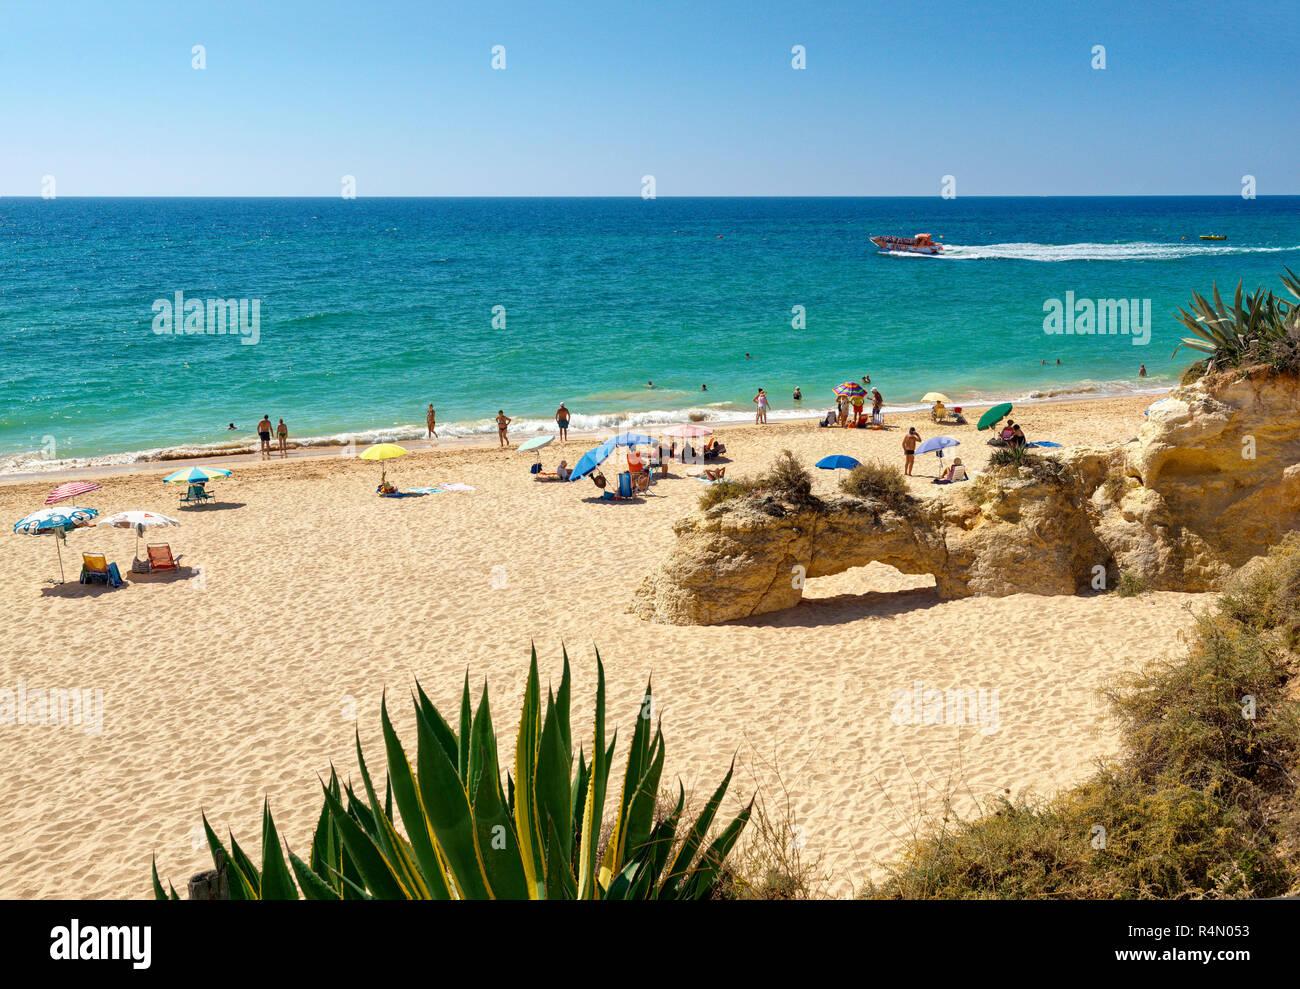 Detail of Armacao de Pera beach - Stock Image